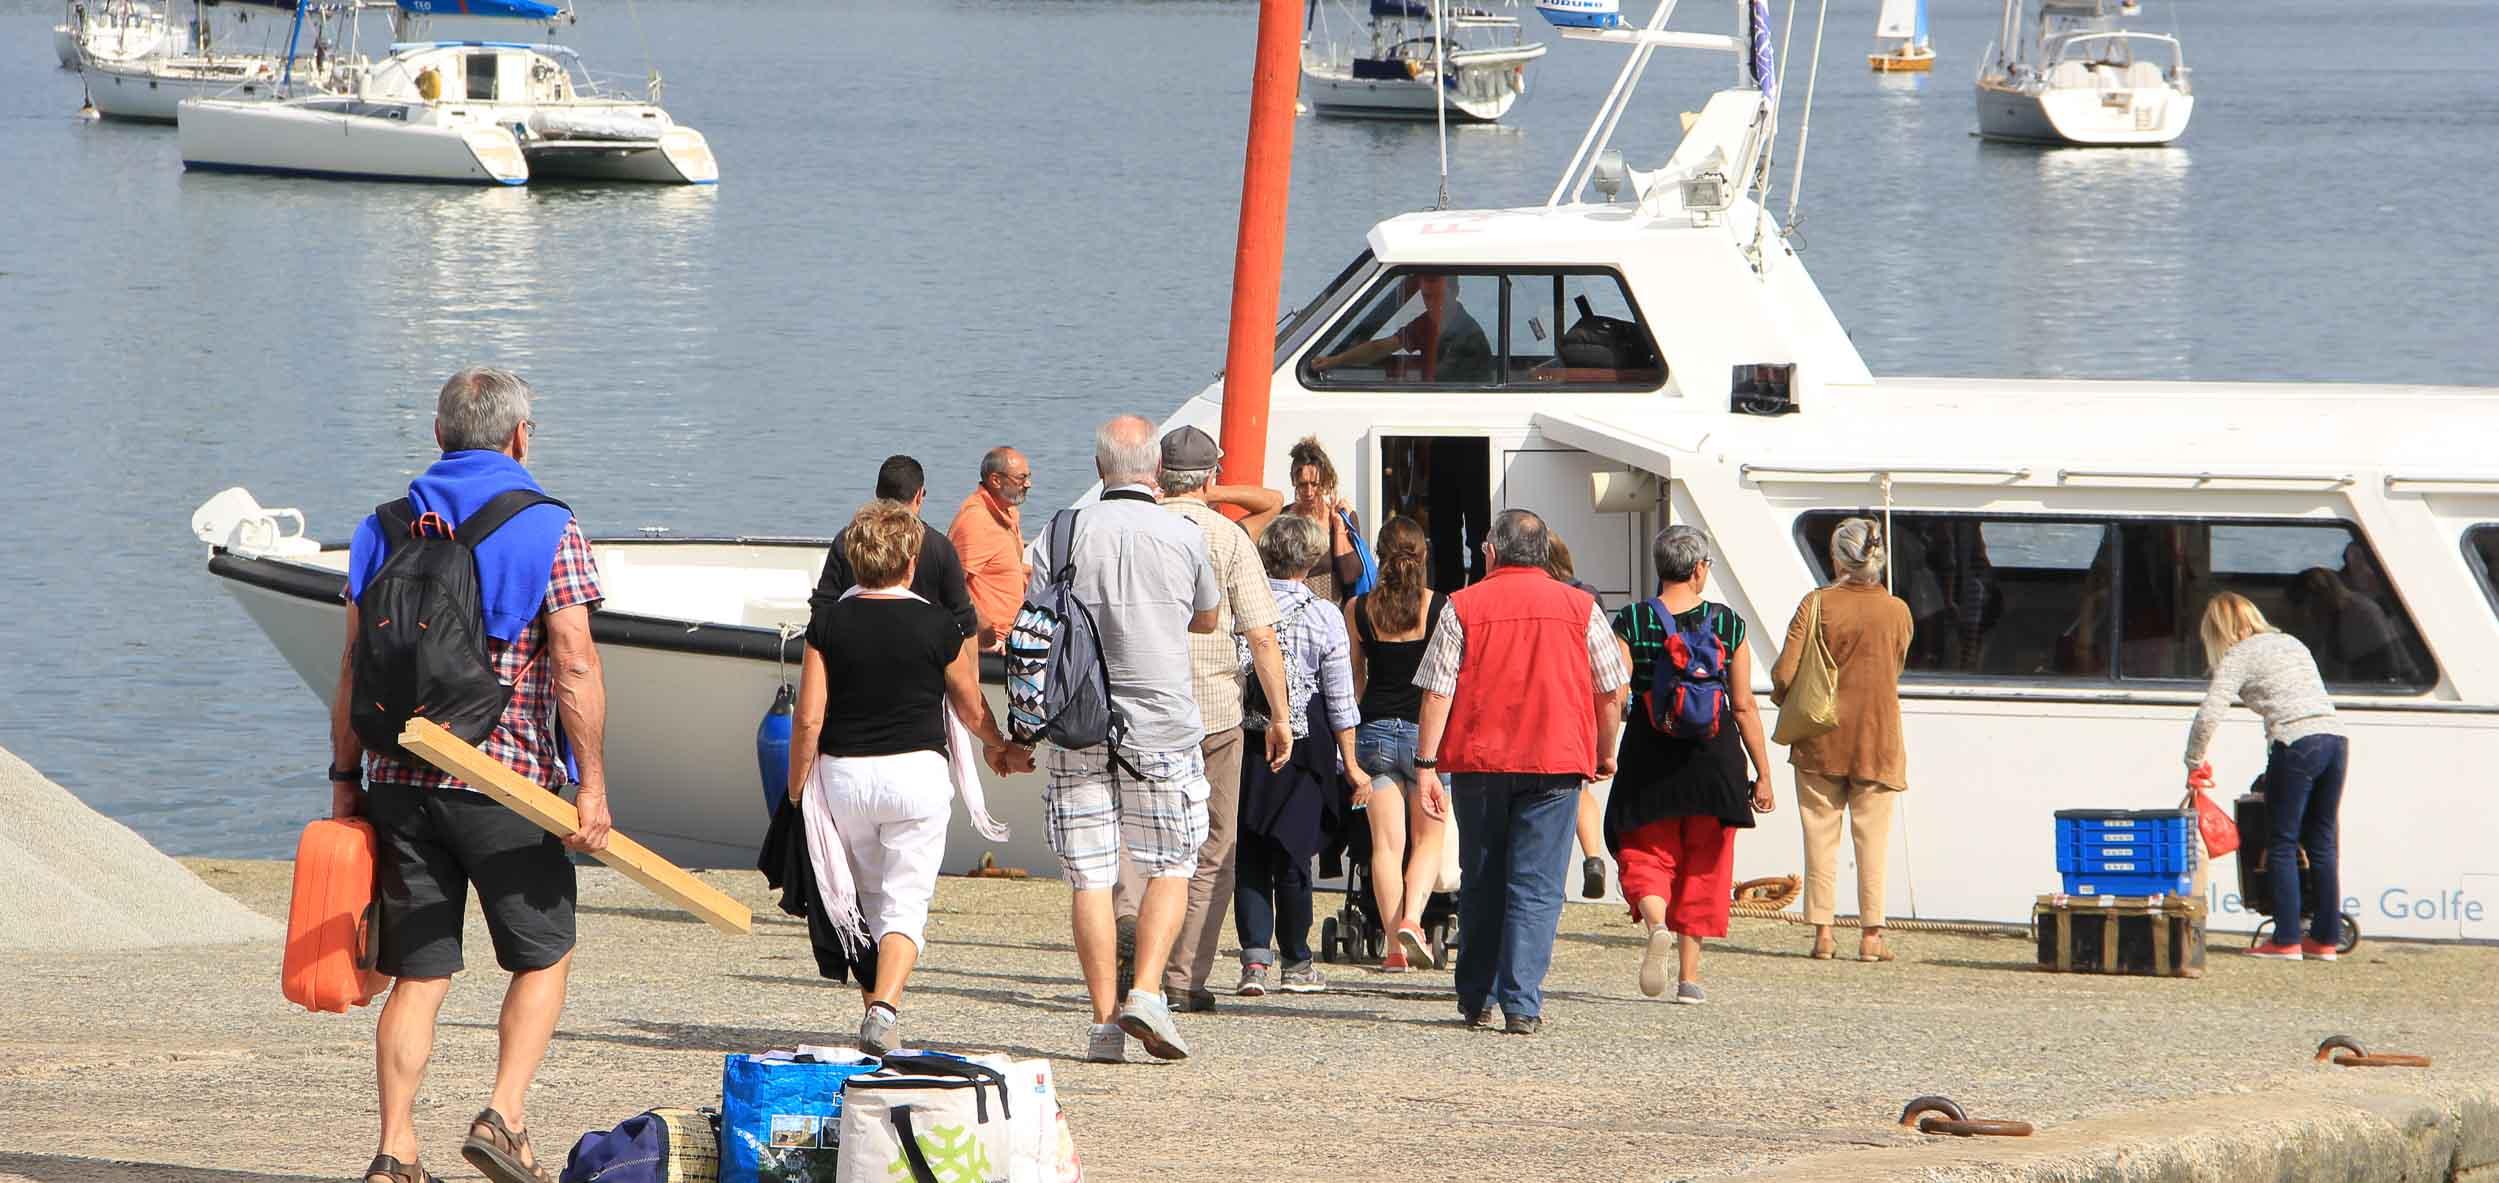 Escapade dans le Golfe du Morbihan #3